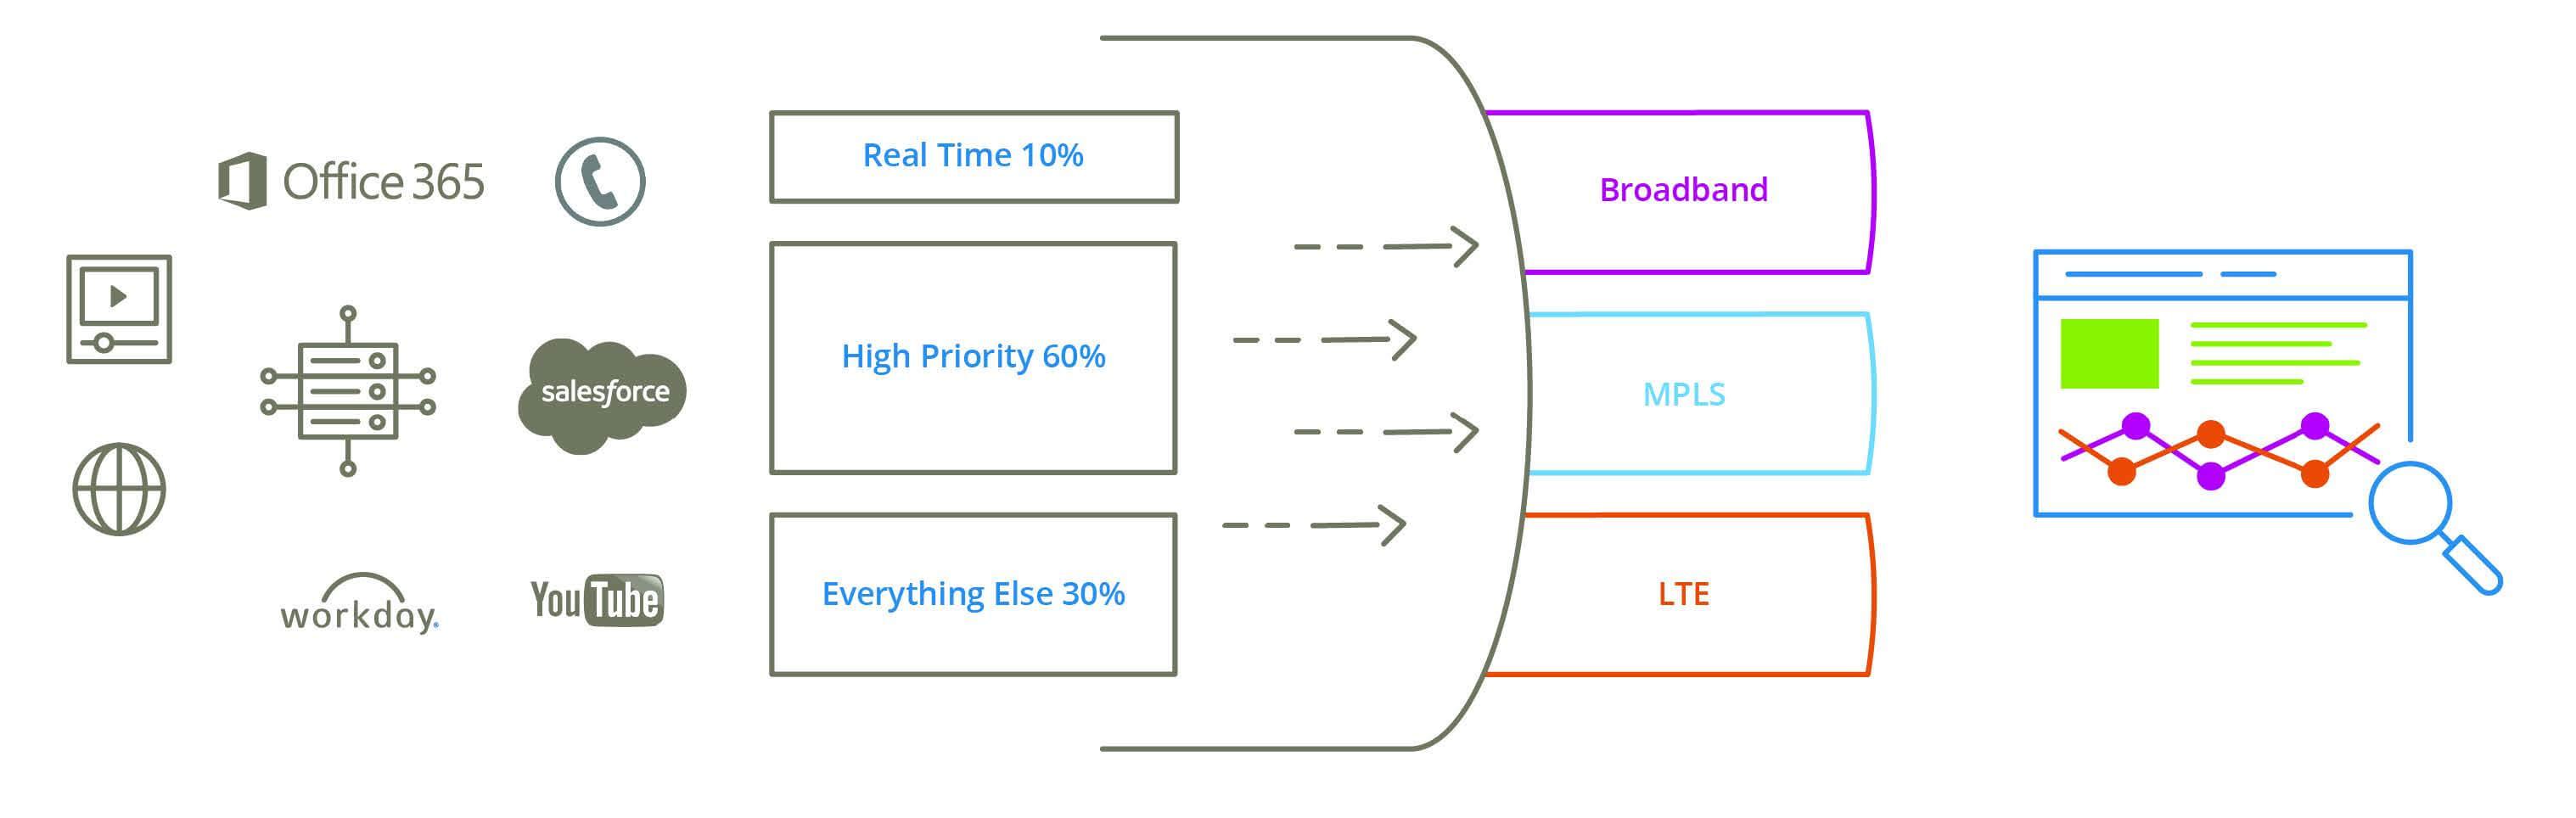 figure 5: granular traffic shaping and prioritization assures application  qos while optimizing bandwidth utilization